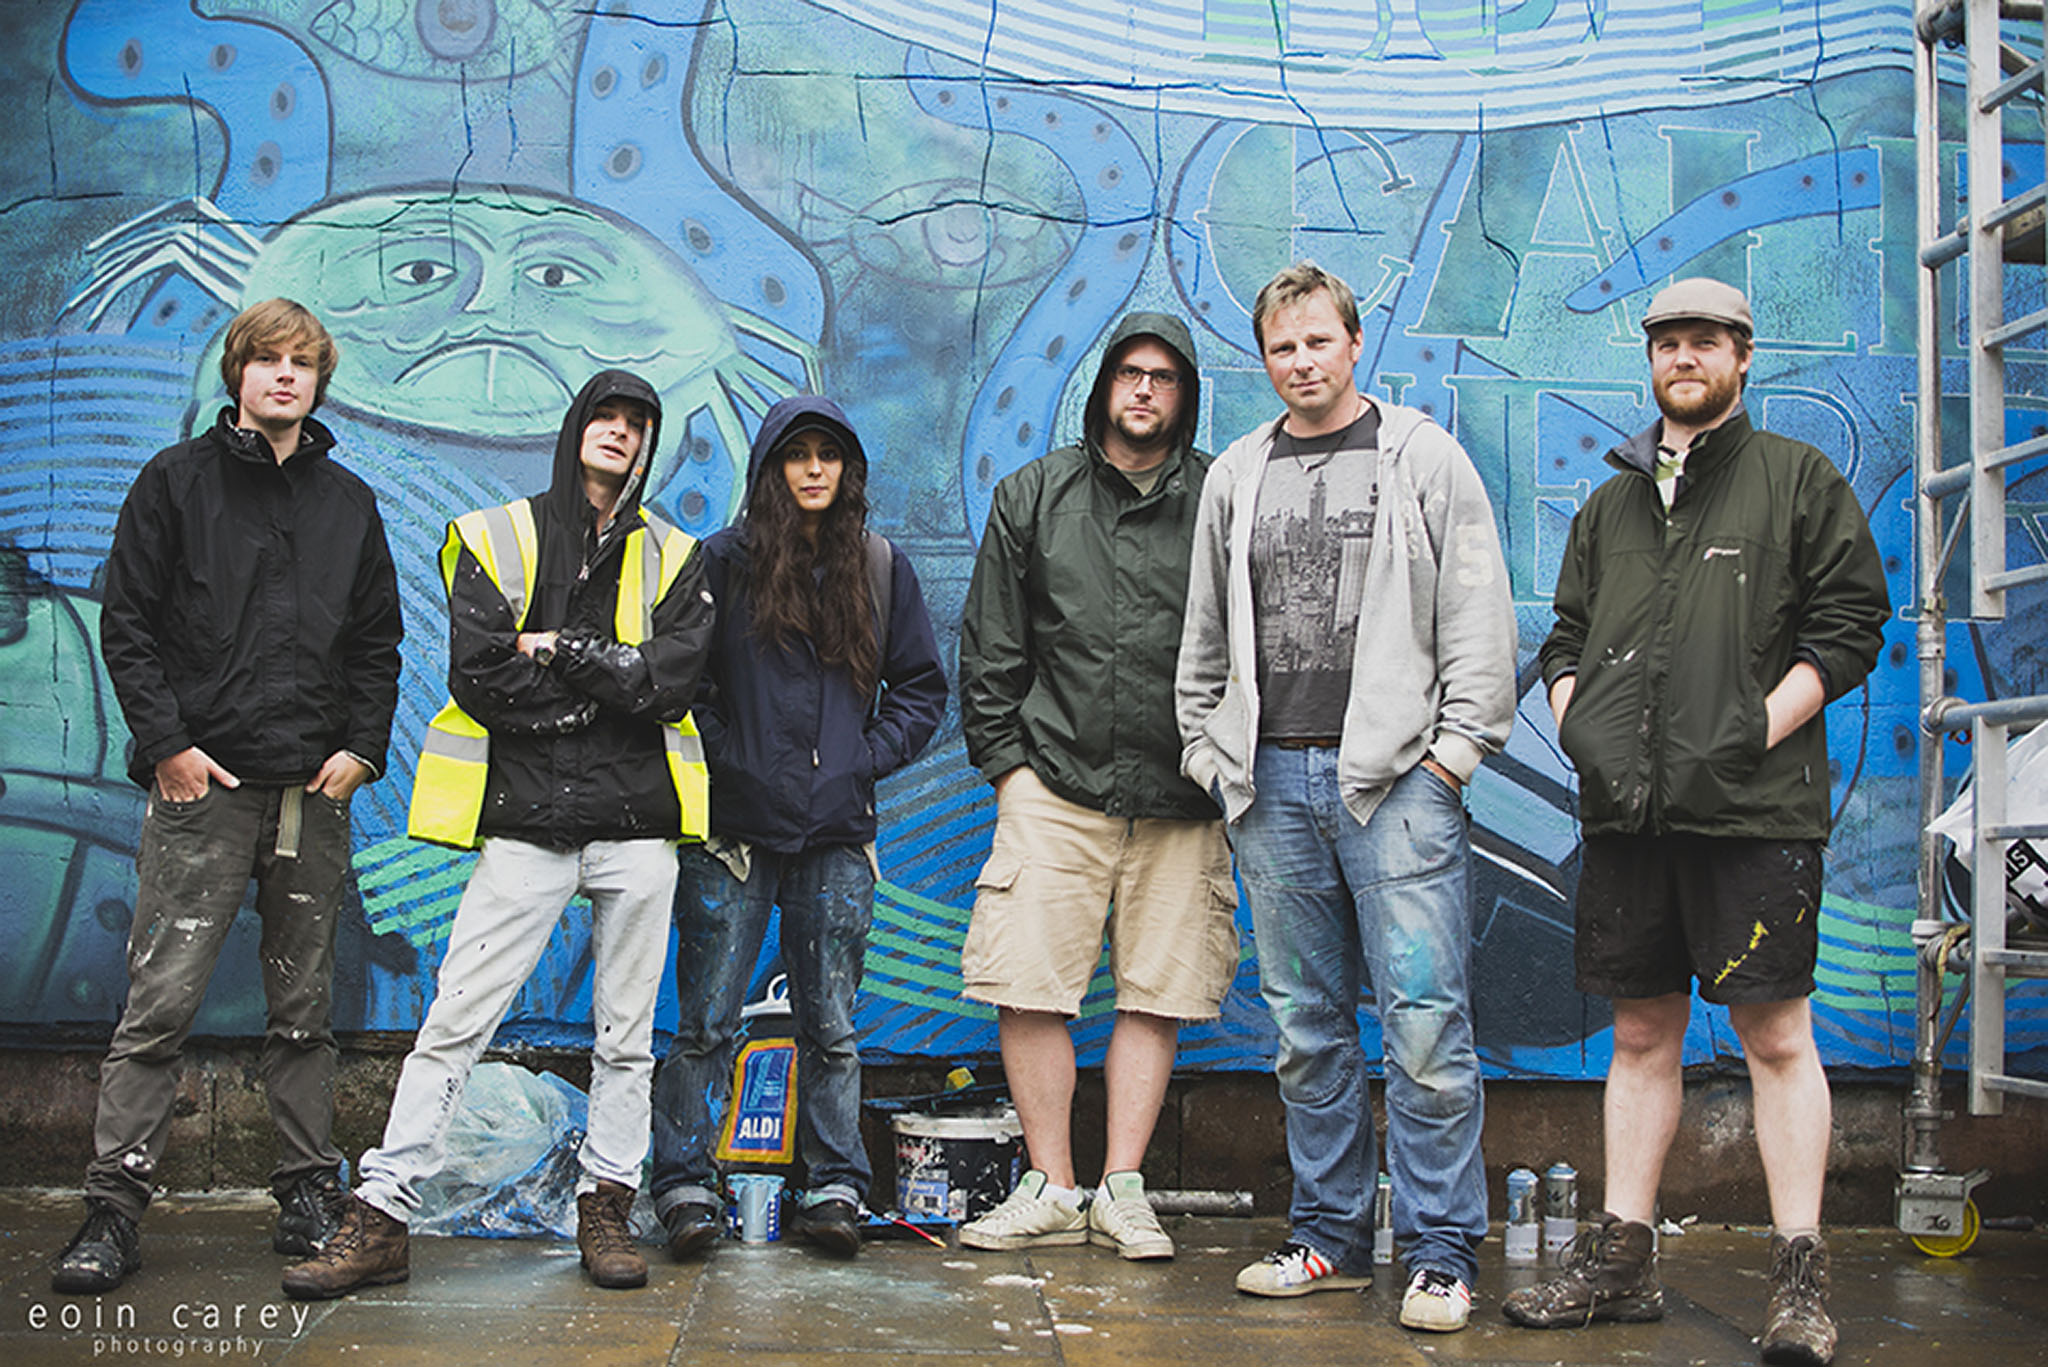 The Leith Aquatic, Blameless Collective